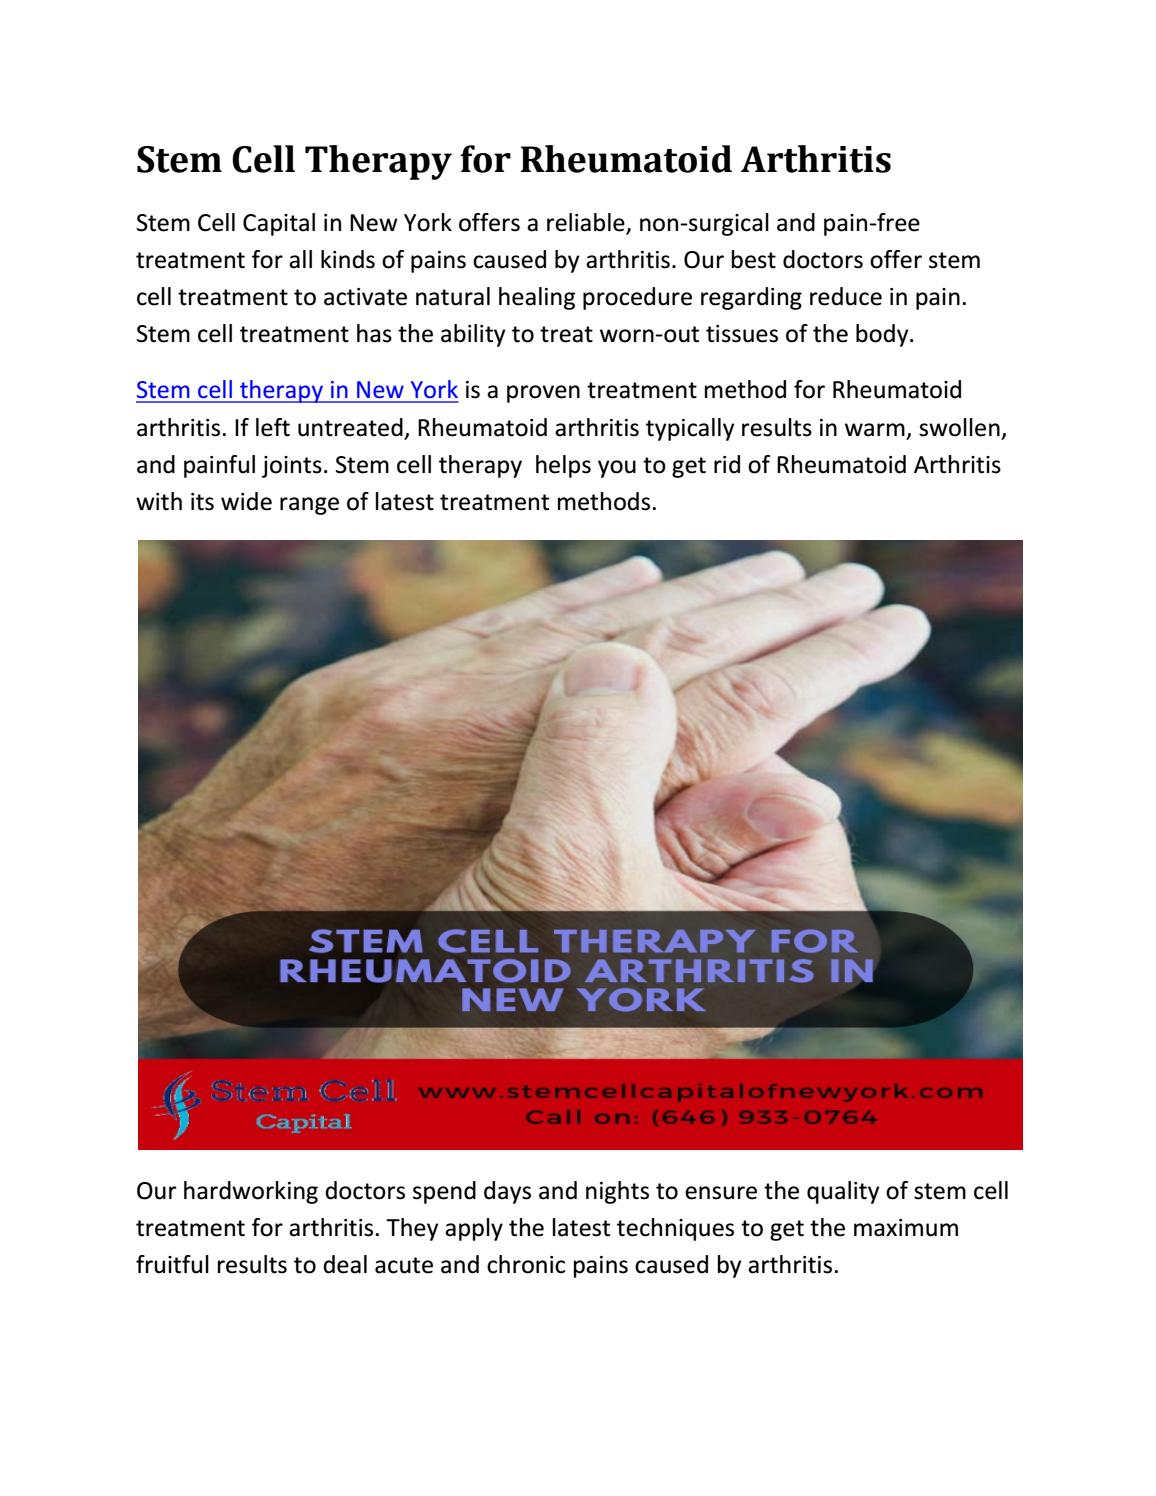 Stem Cell Therapy For Rheumatoid Arthritis By Georginaewagne720 Issuu